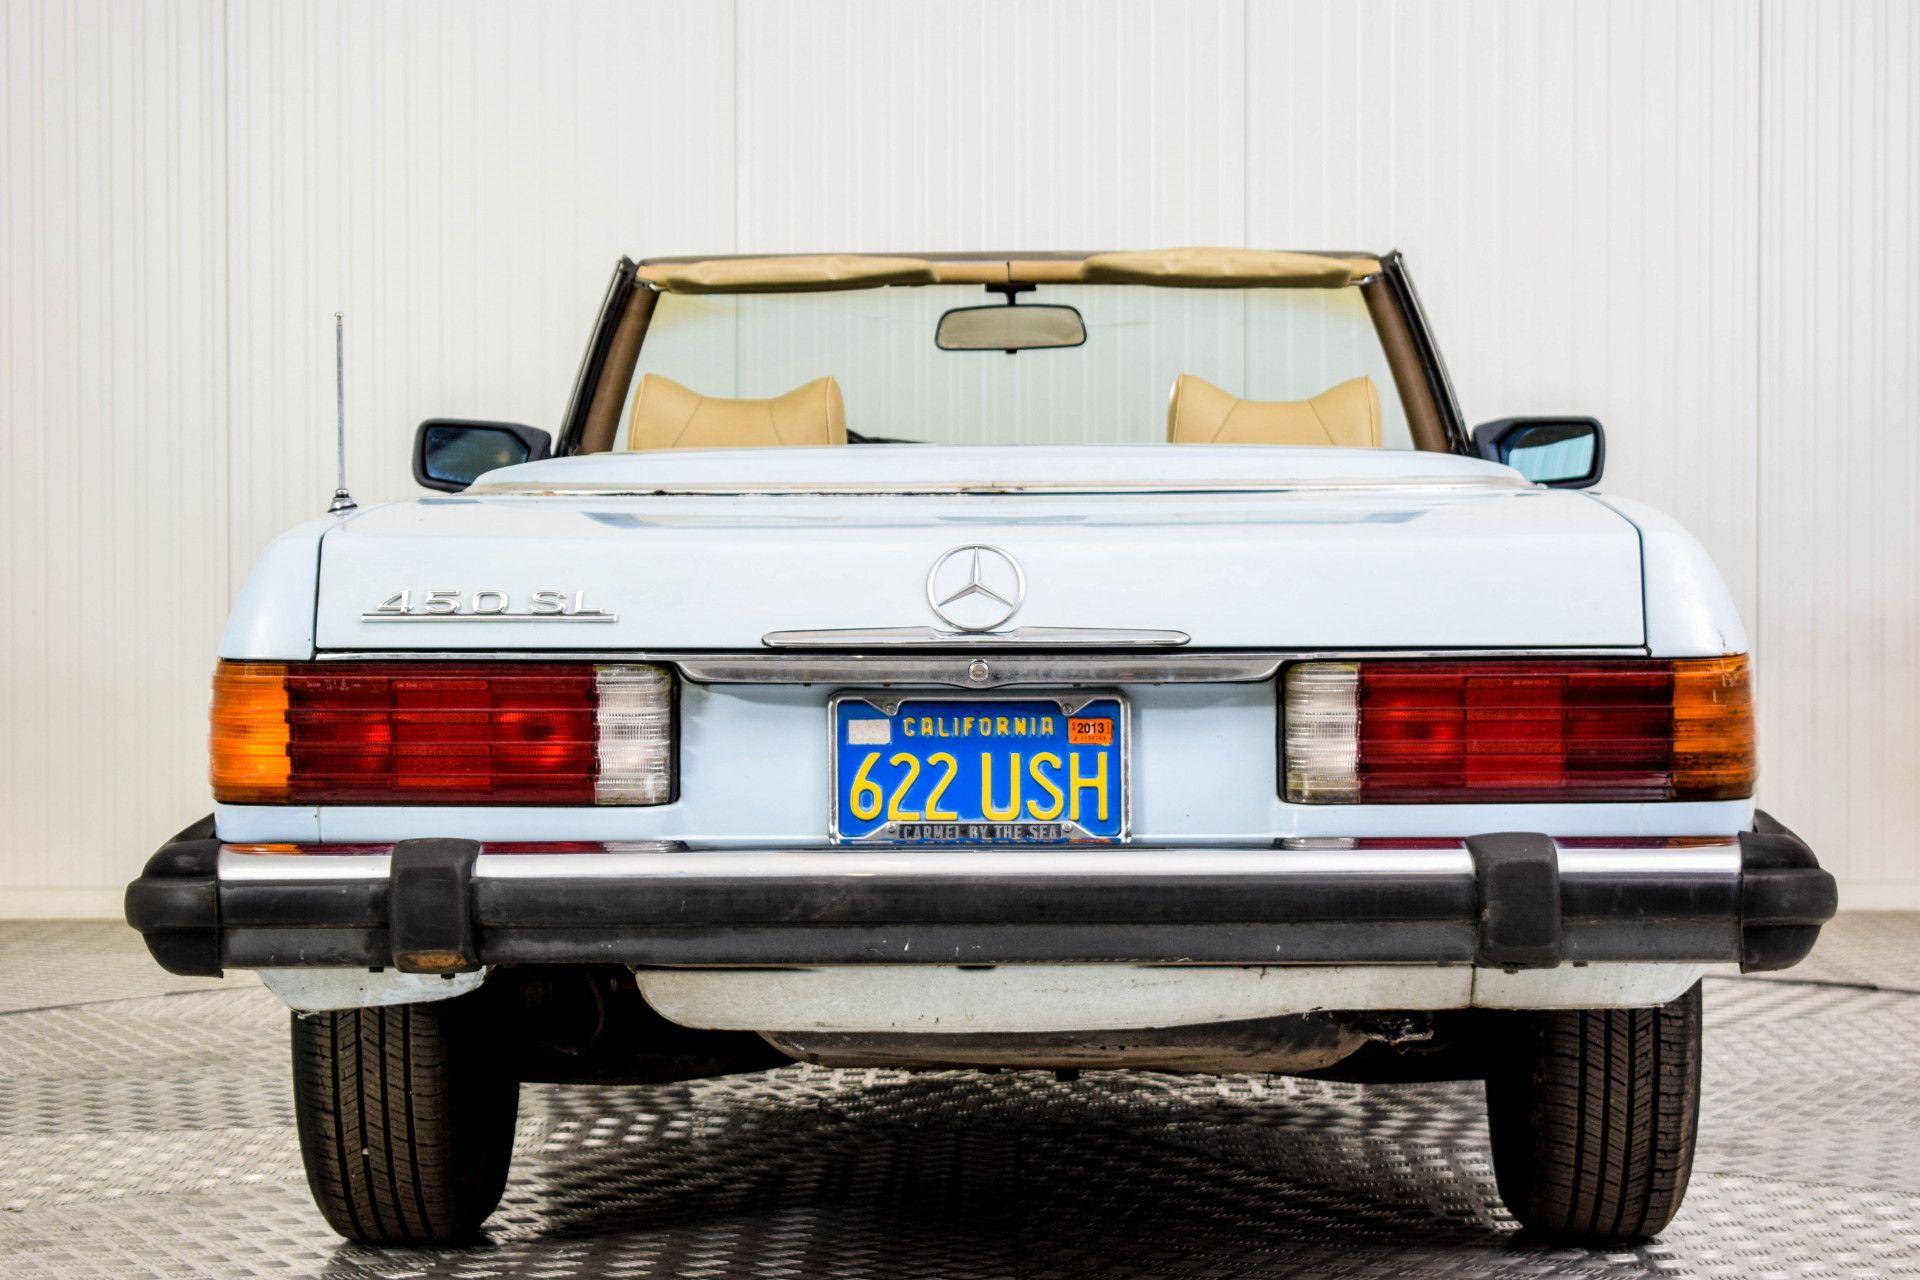 Mercedes-Benz SL-Klasse 450 SL Roadster Foto 8